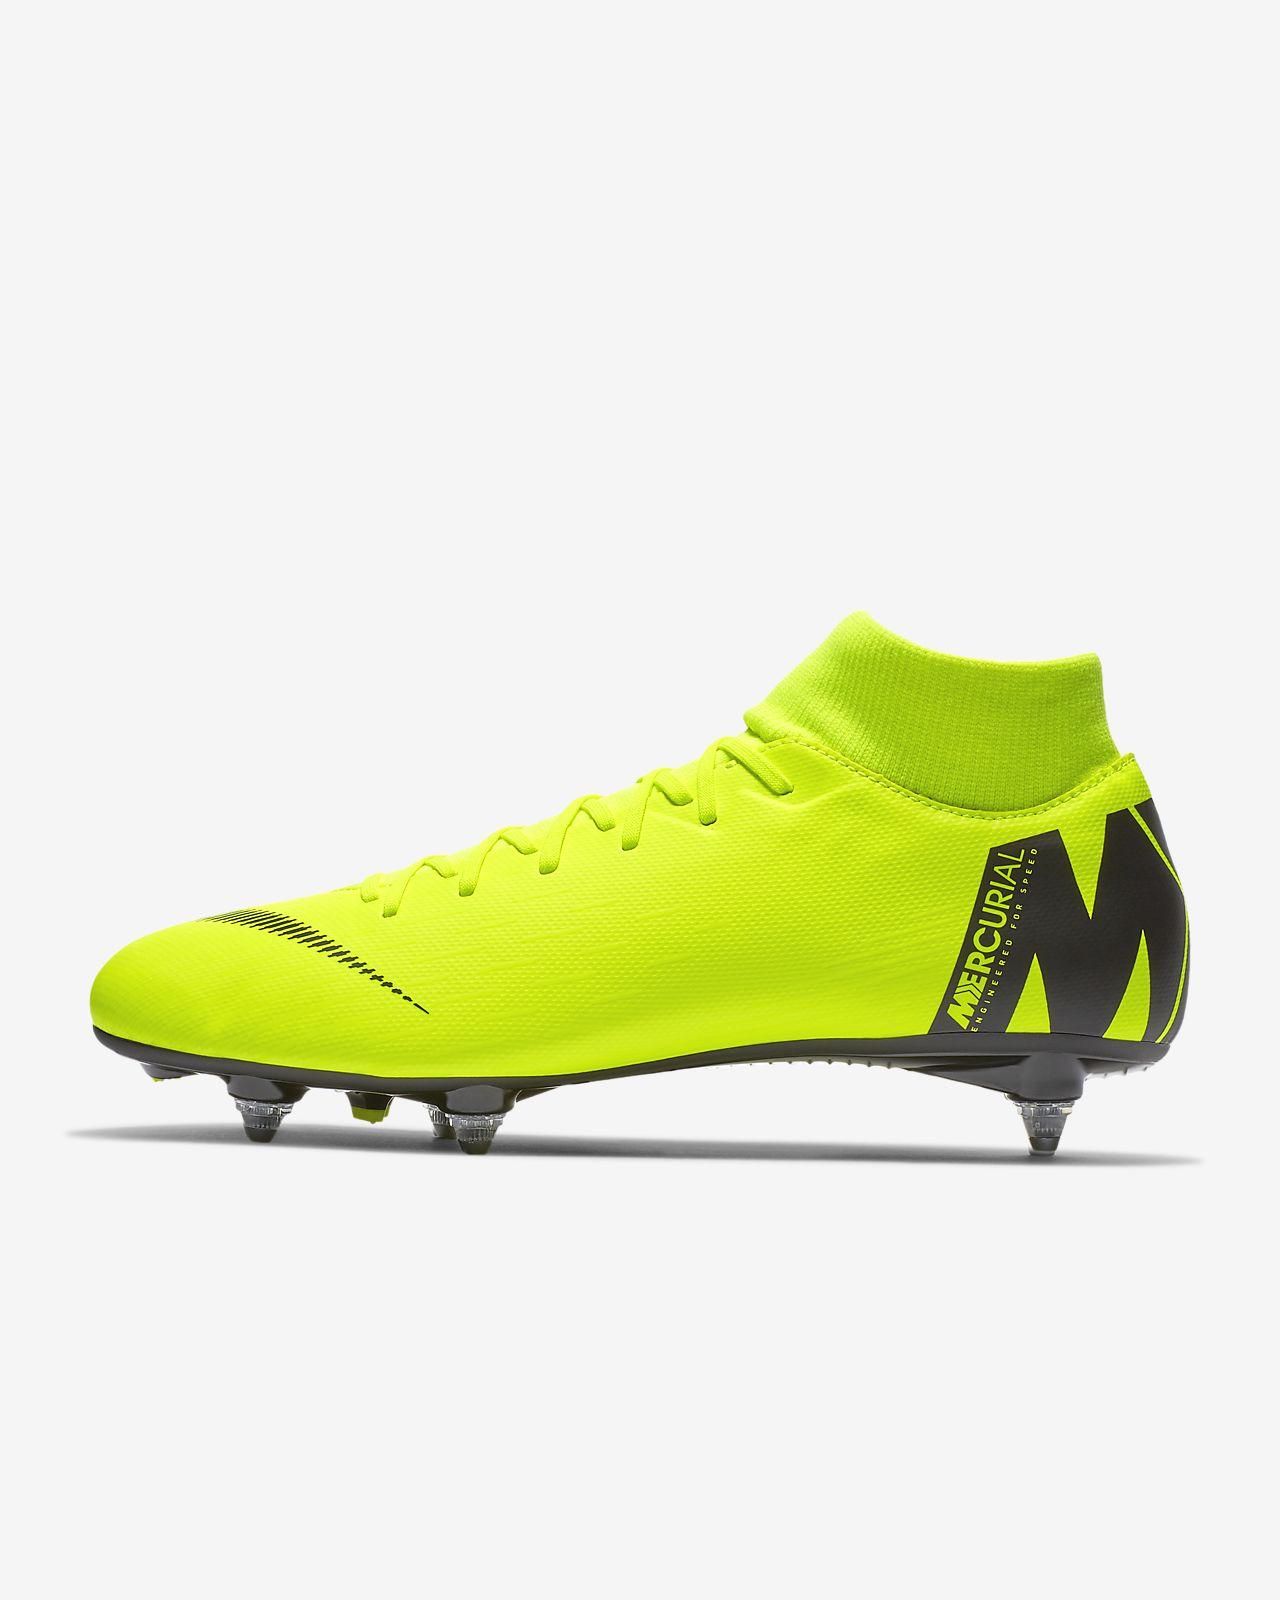 brand new d041a c5208 ... Chaussure de football à crampons pour terrain gras Nike Mercurial  Superfly VI Academy SG-PRO